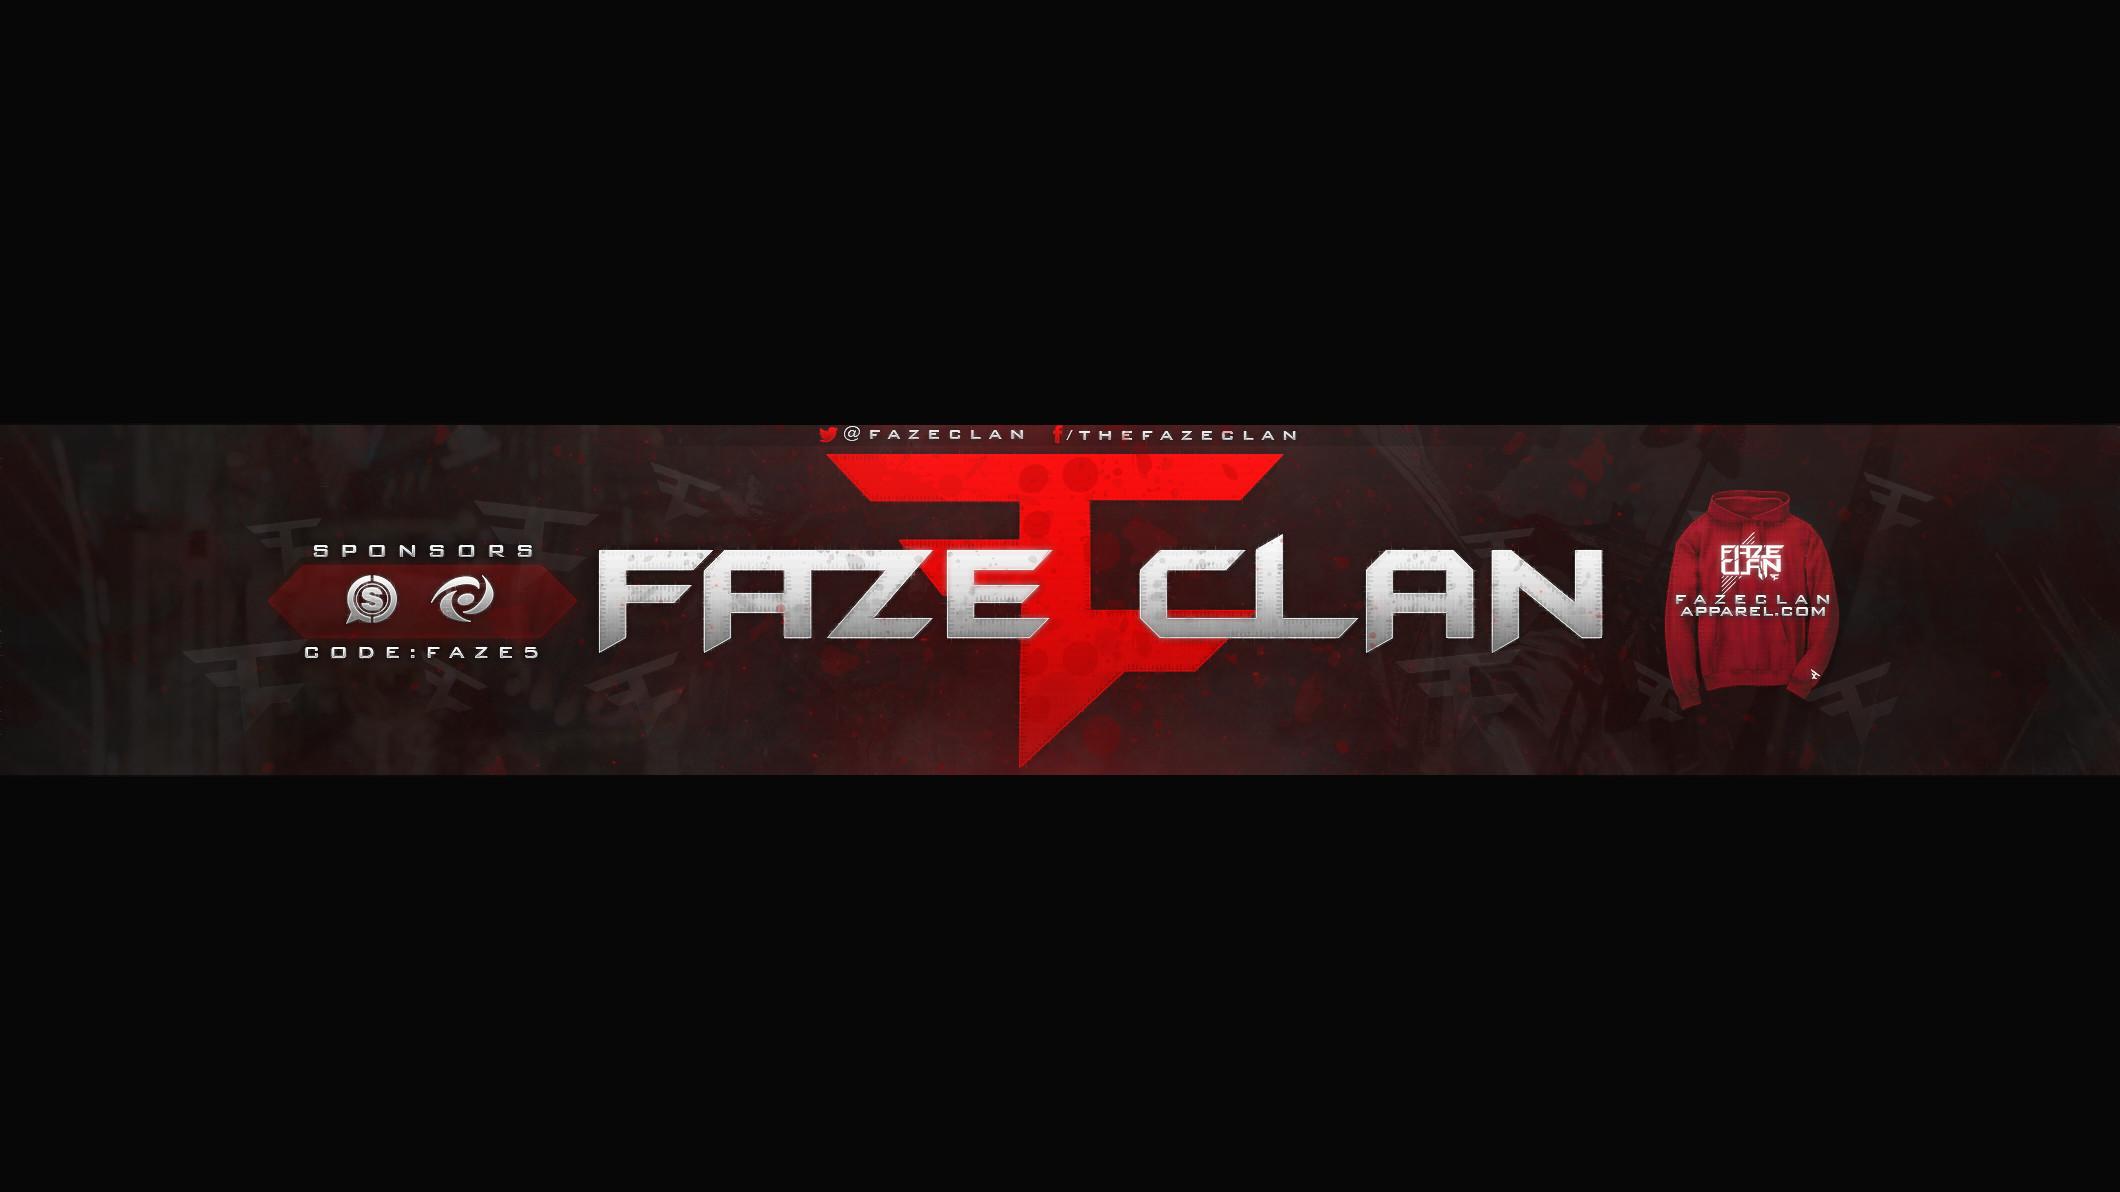 Res: 2120x1192, FaZe Clan Banner by dznRazer FaZe Clan Banner by dznRazer